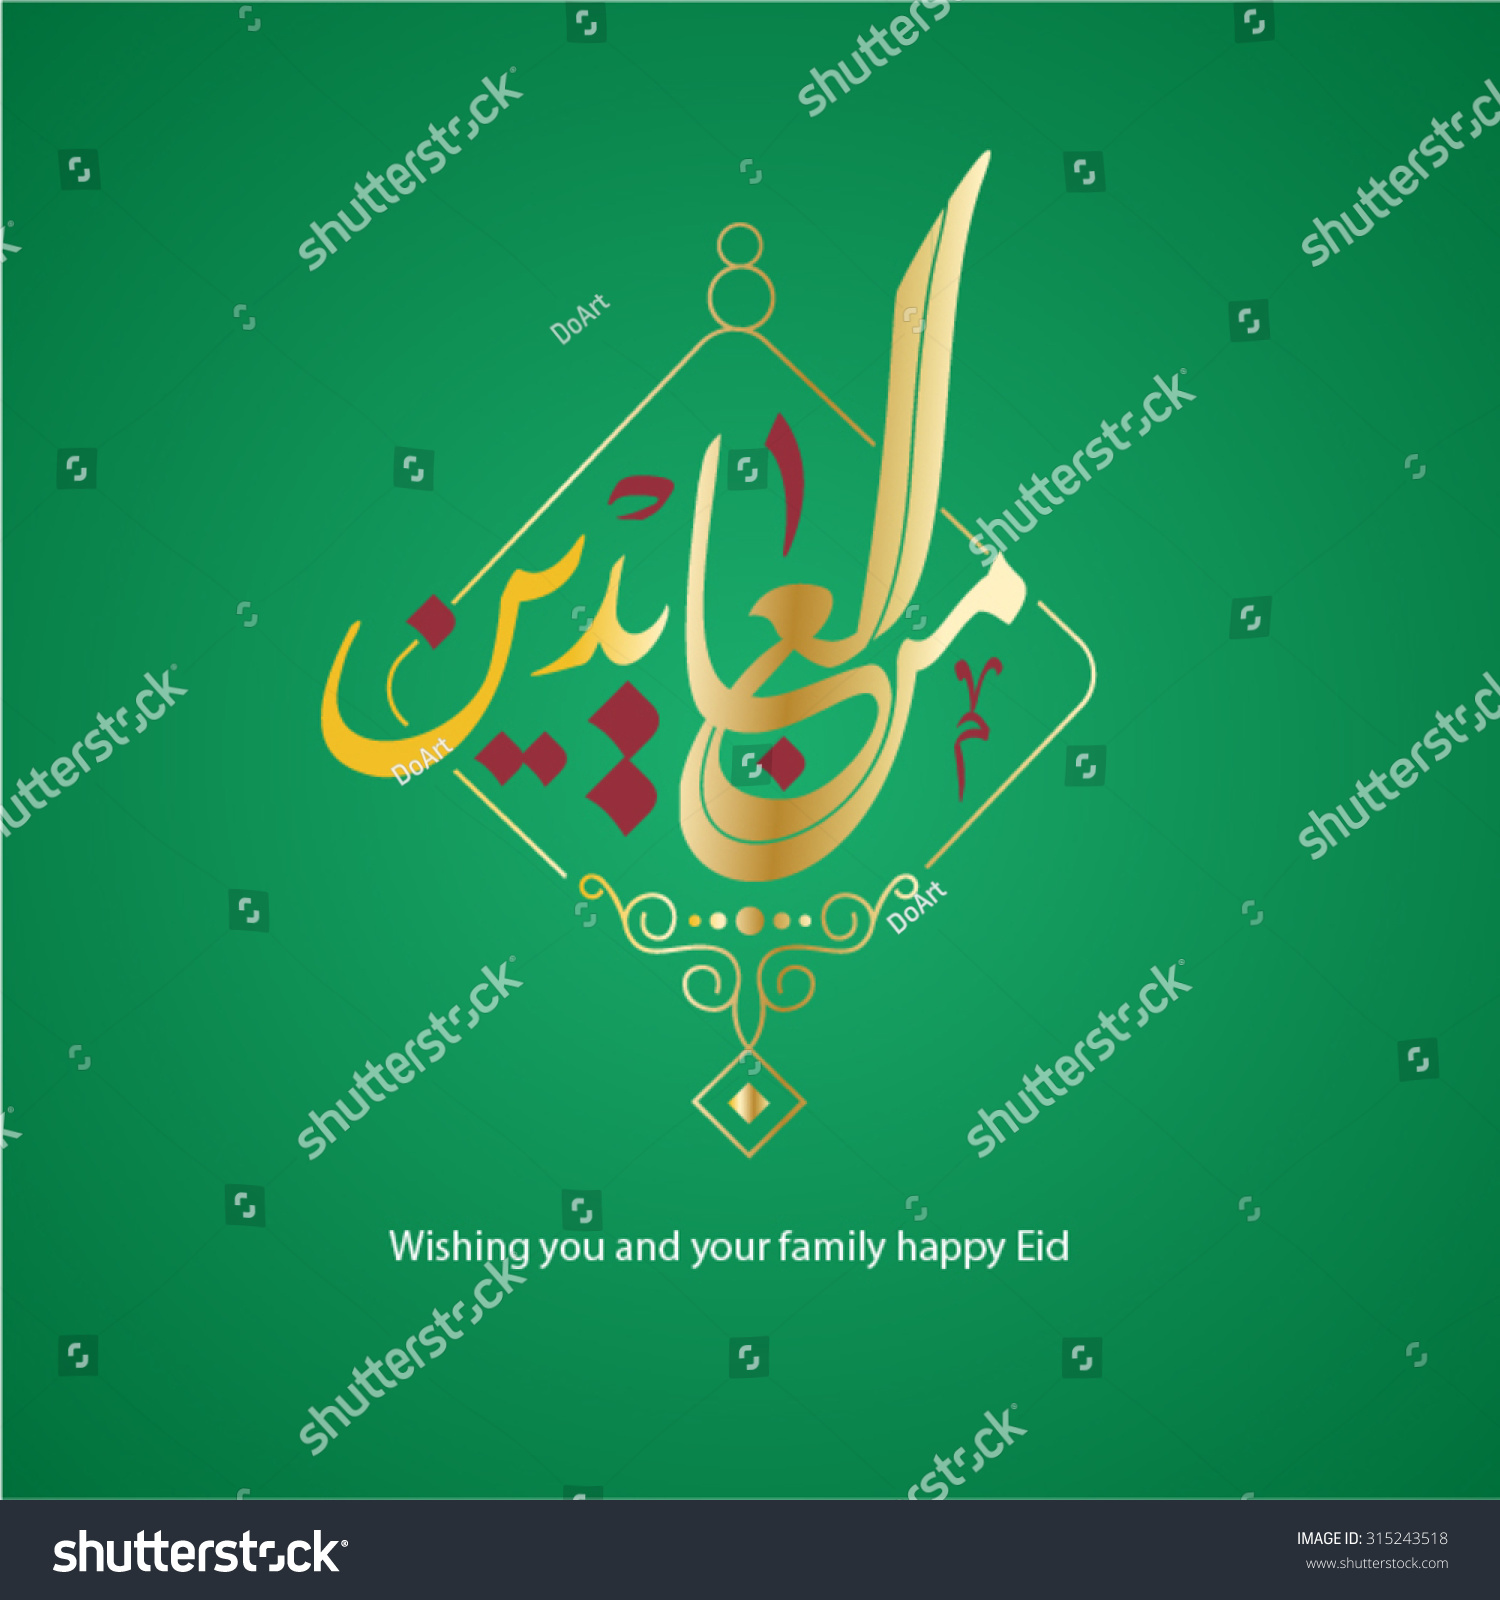 Similar Images Stock Photos Vectors Of Eid Mubarak Greeting